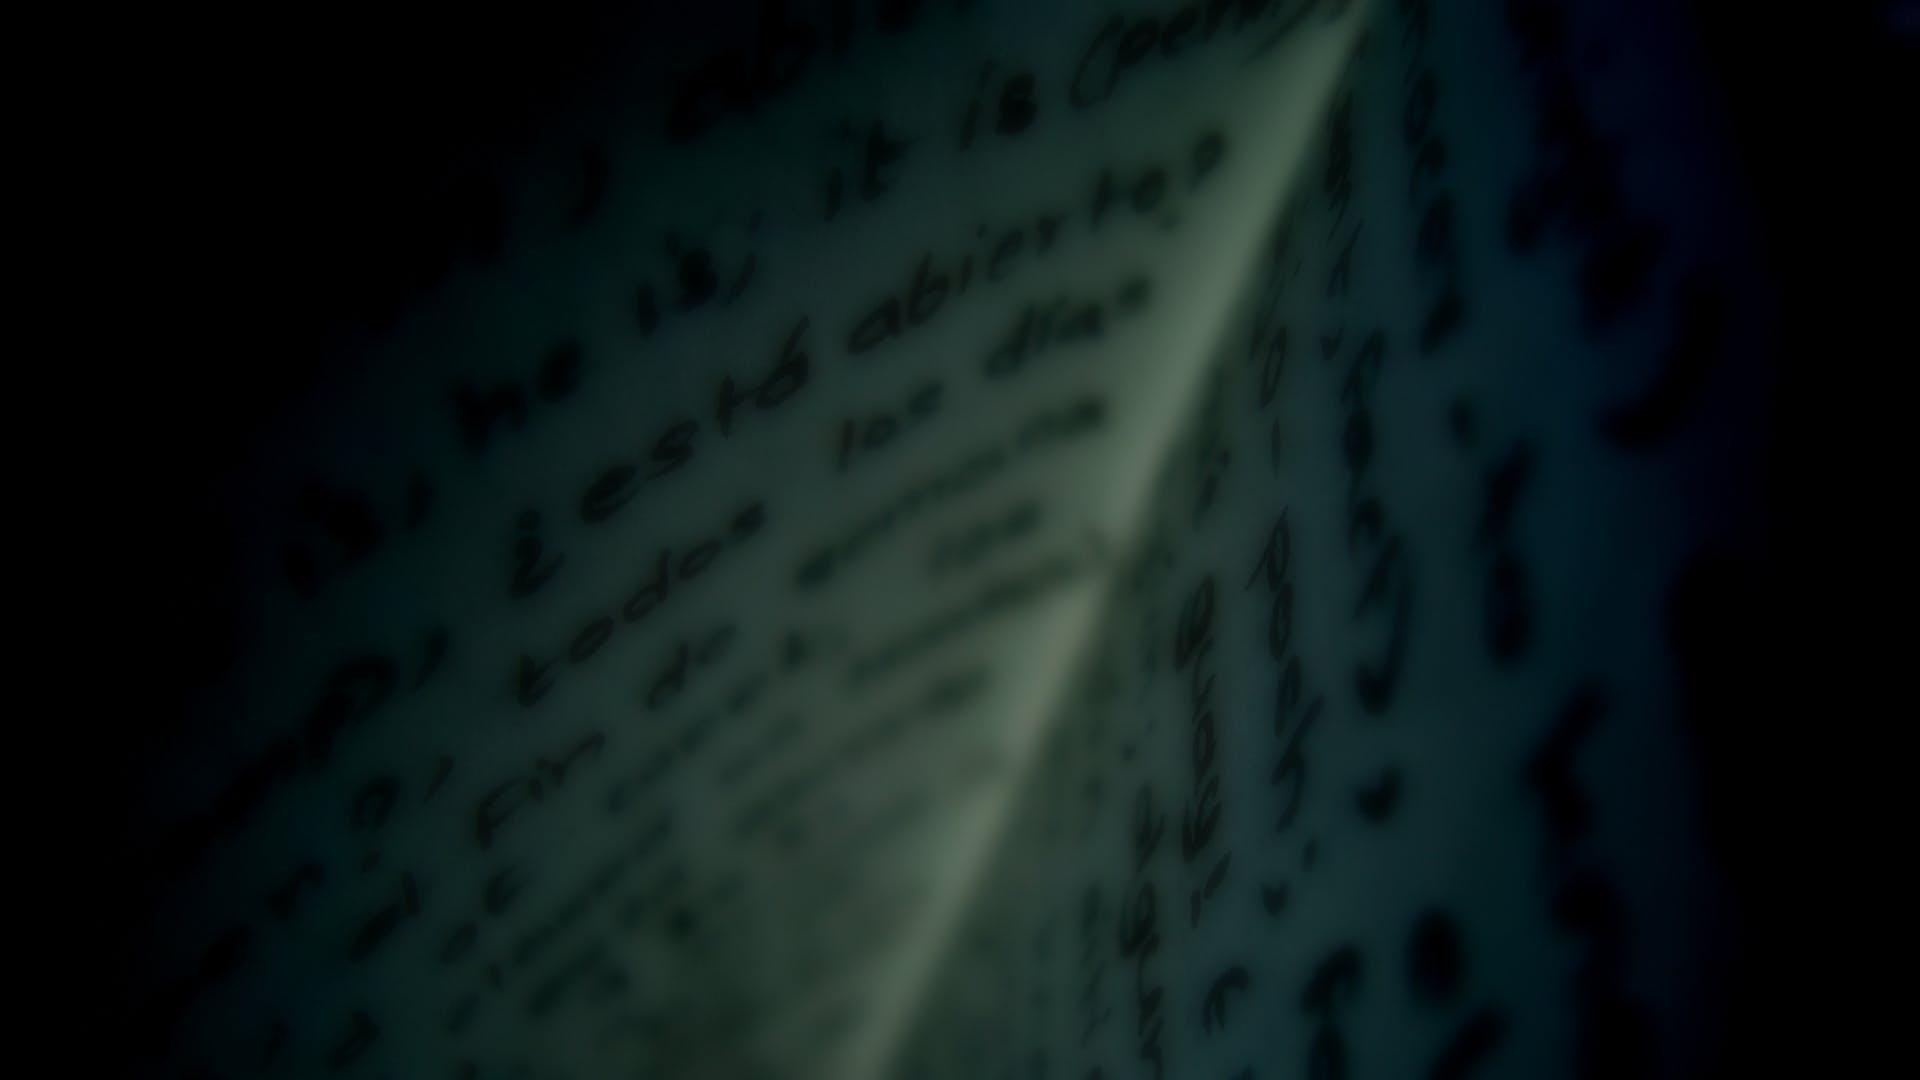 españa black and white notes night black handwriting dark